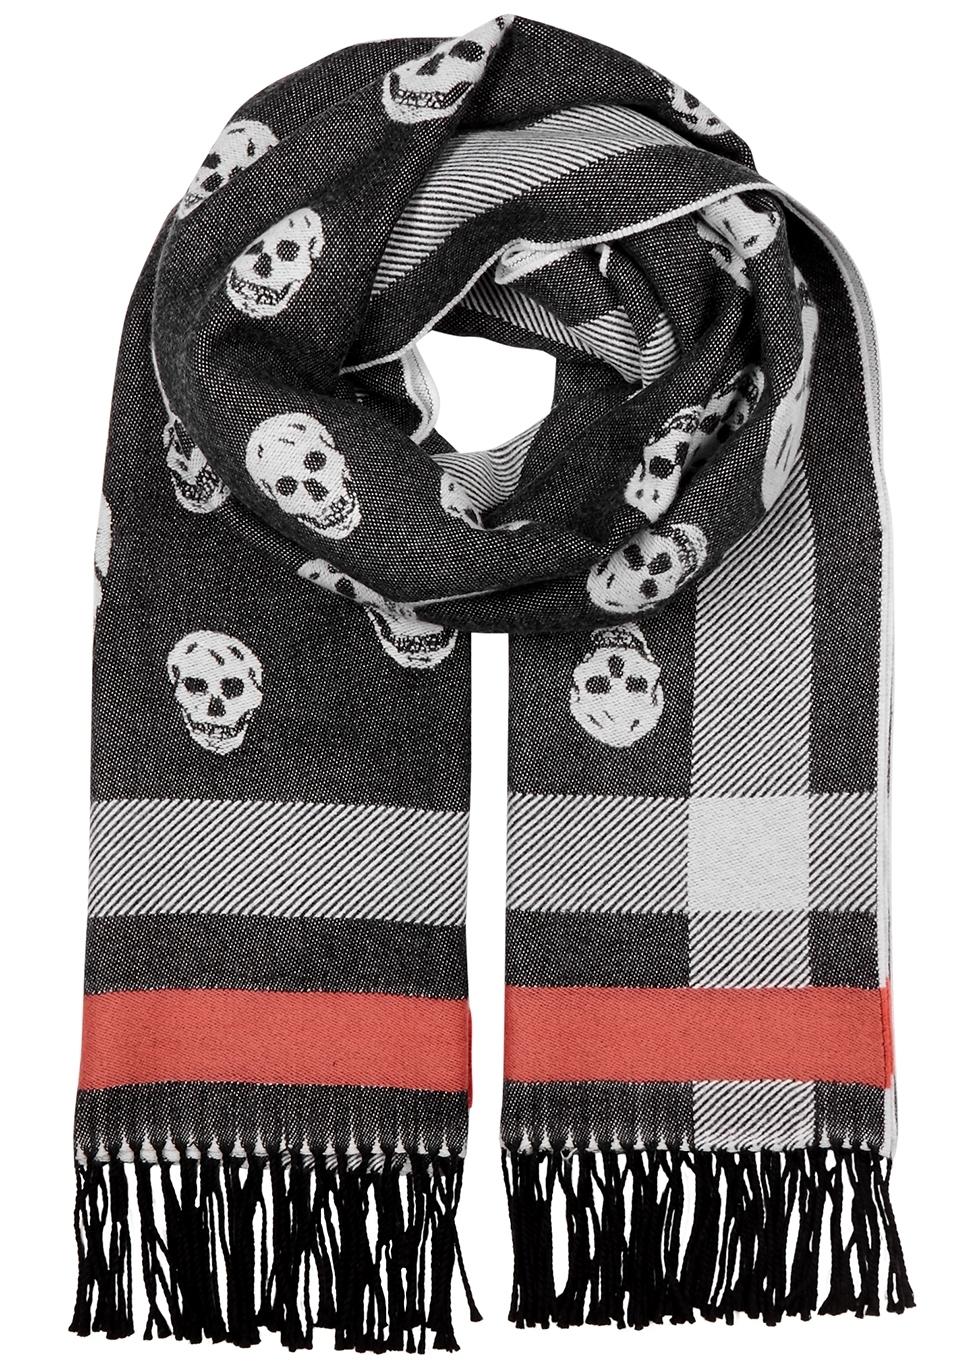 9cbb4a3c06a1 Women s Designer Scarves and Accessories - Harvey Nichols